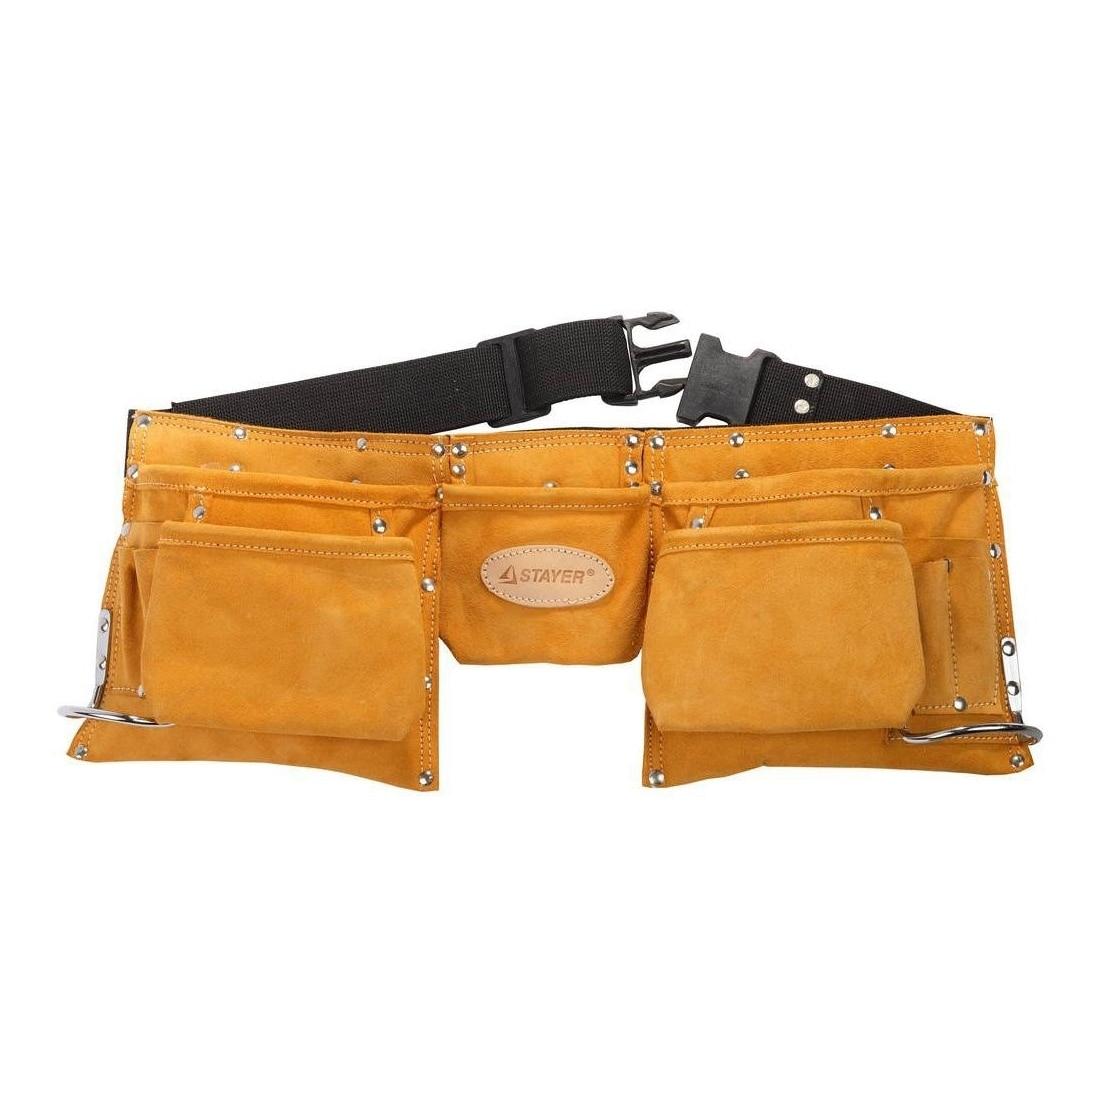 Фото - Bag belt tool STAYER 38520 cow leather tote bag brand 2018 bolsa feminina new women handbag 100% genuine leather alligator shoulder bag free shipping